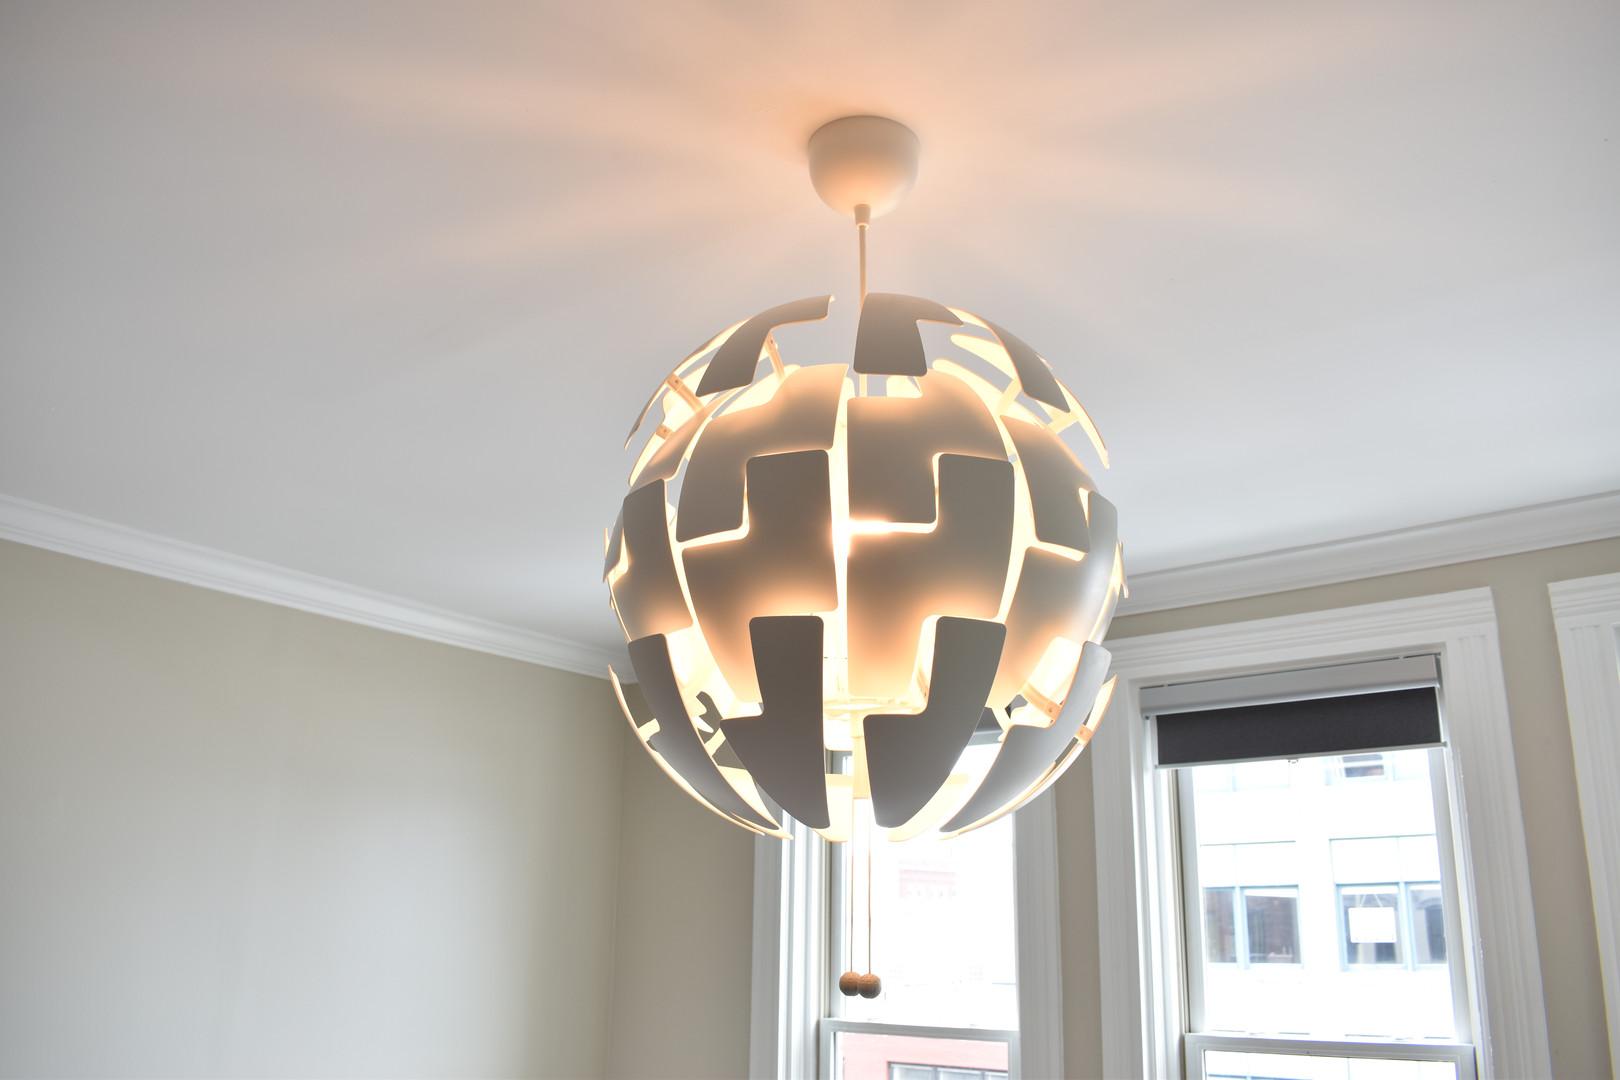 IKEA Light Fixture